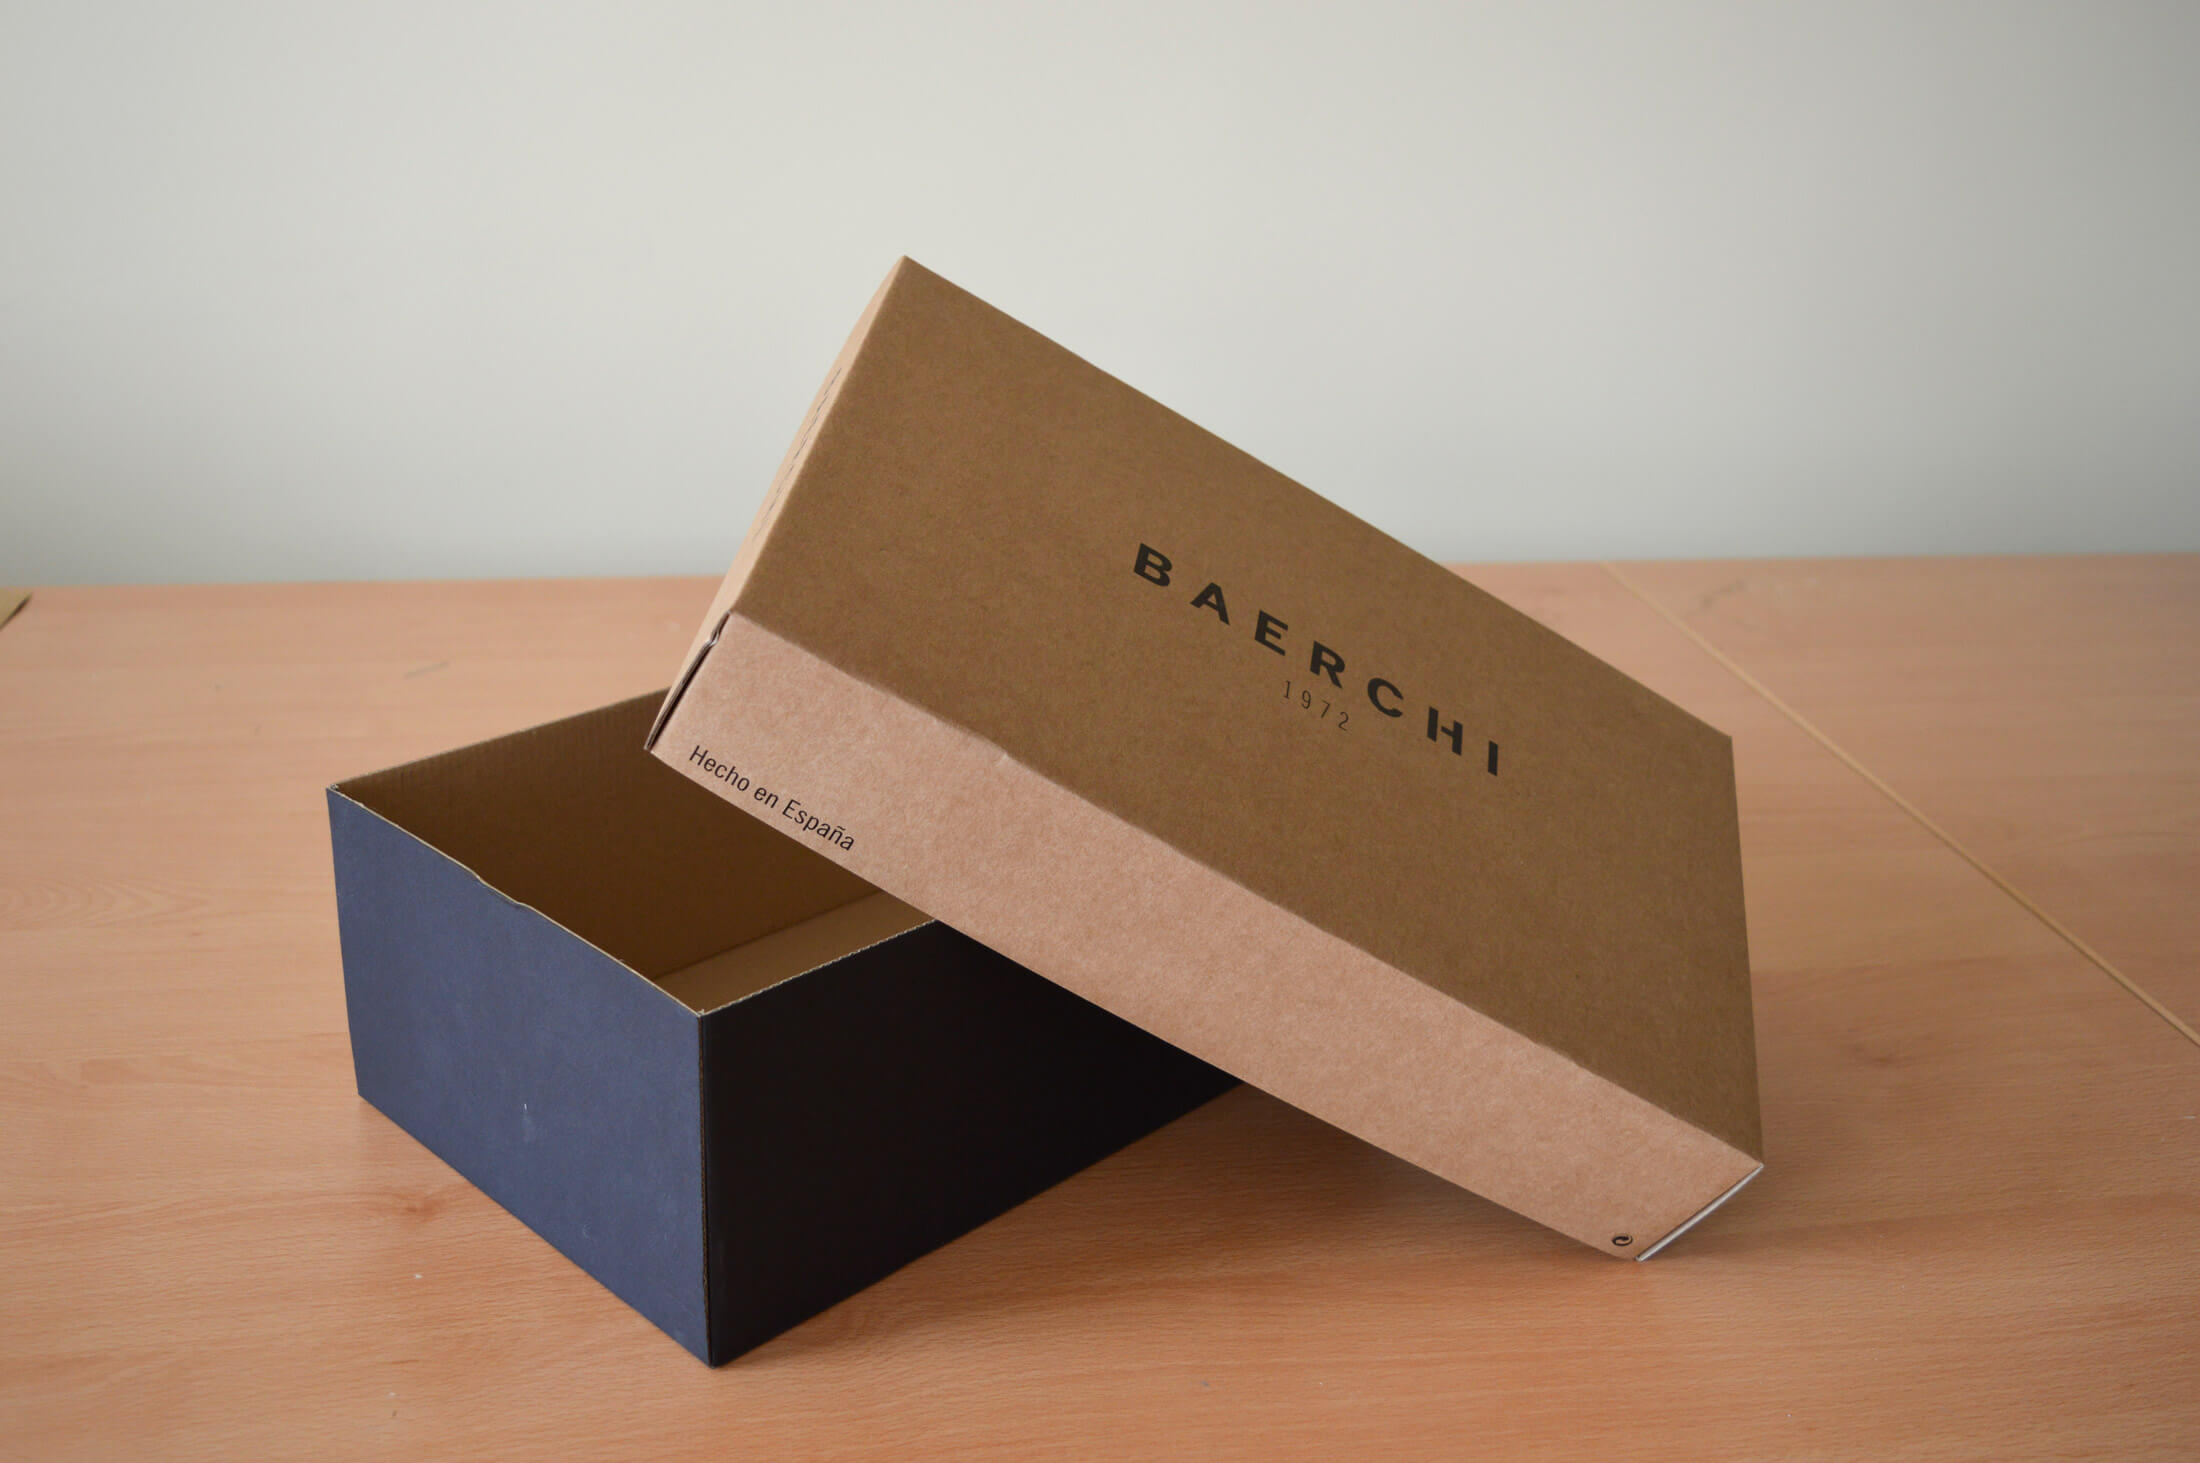 Baerchi – 2016